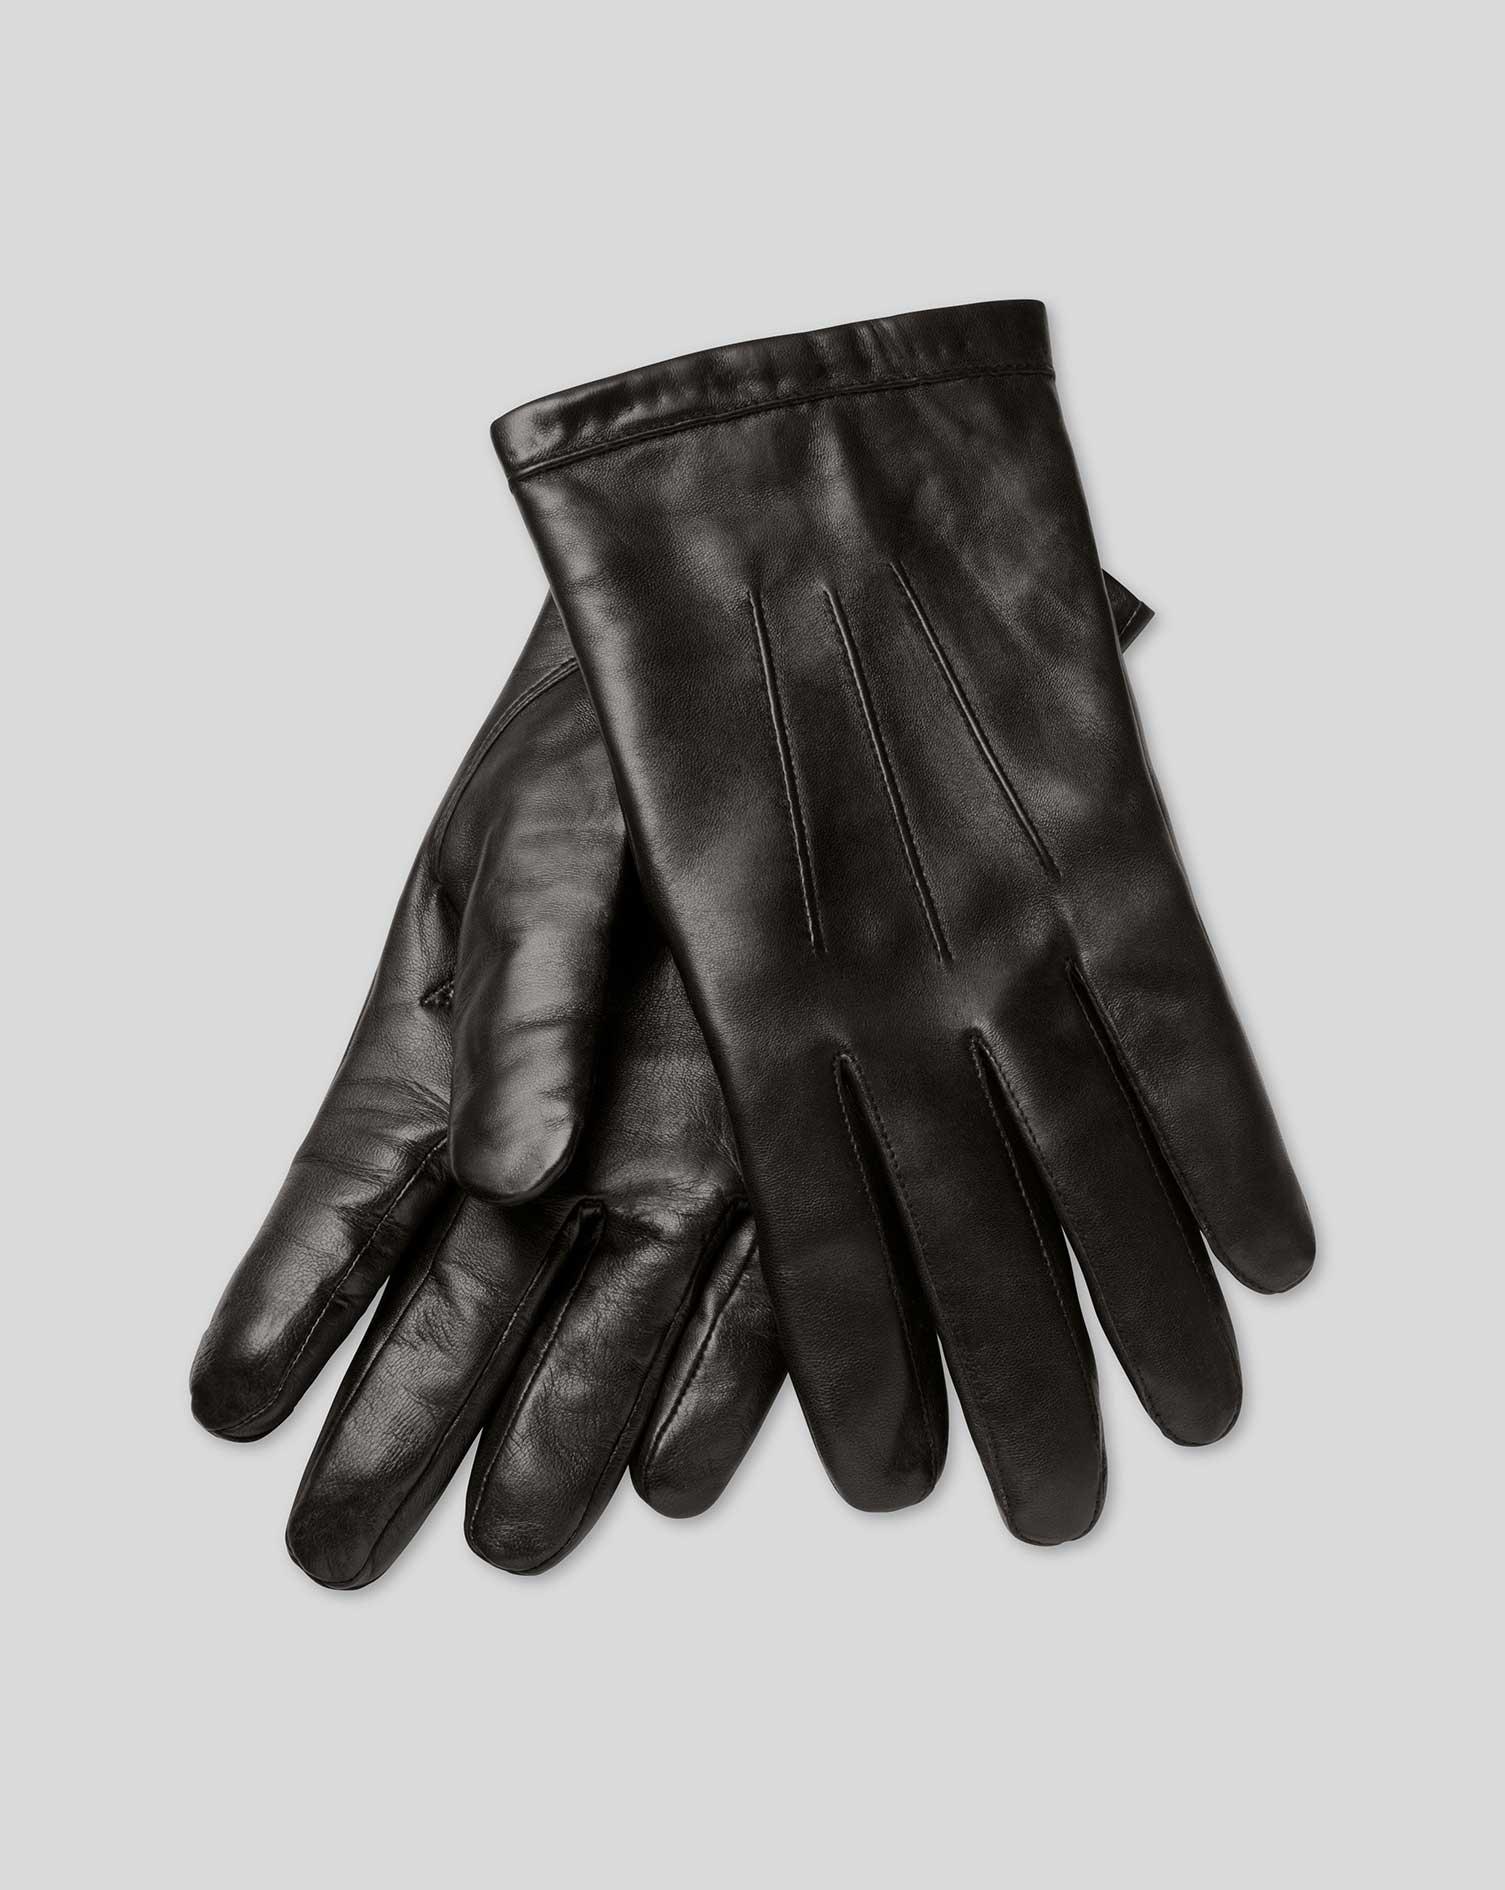 Black or brown leather gloves - Black Leather Gloves